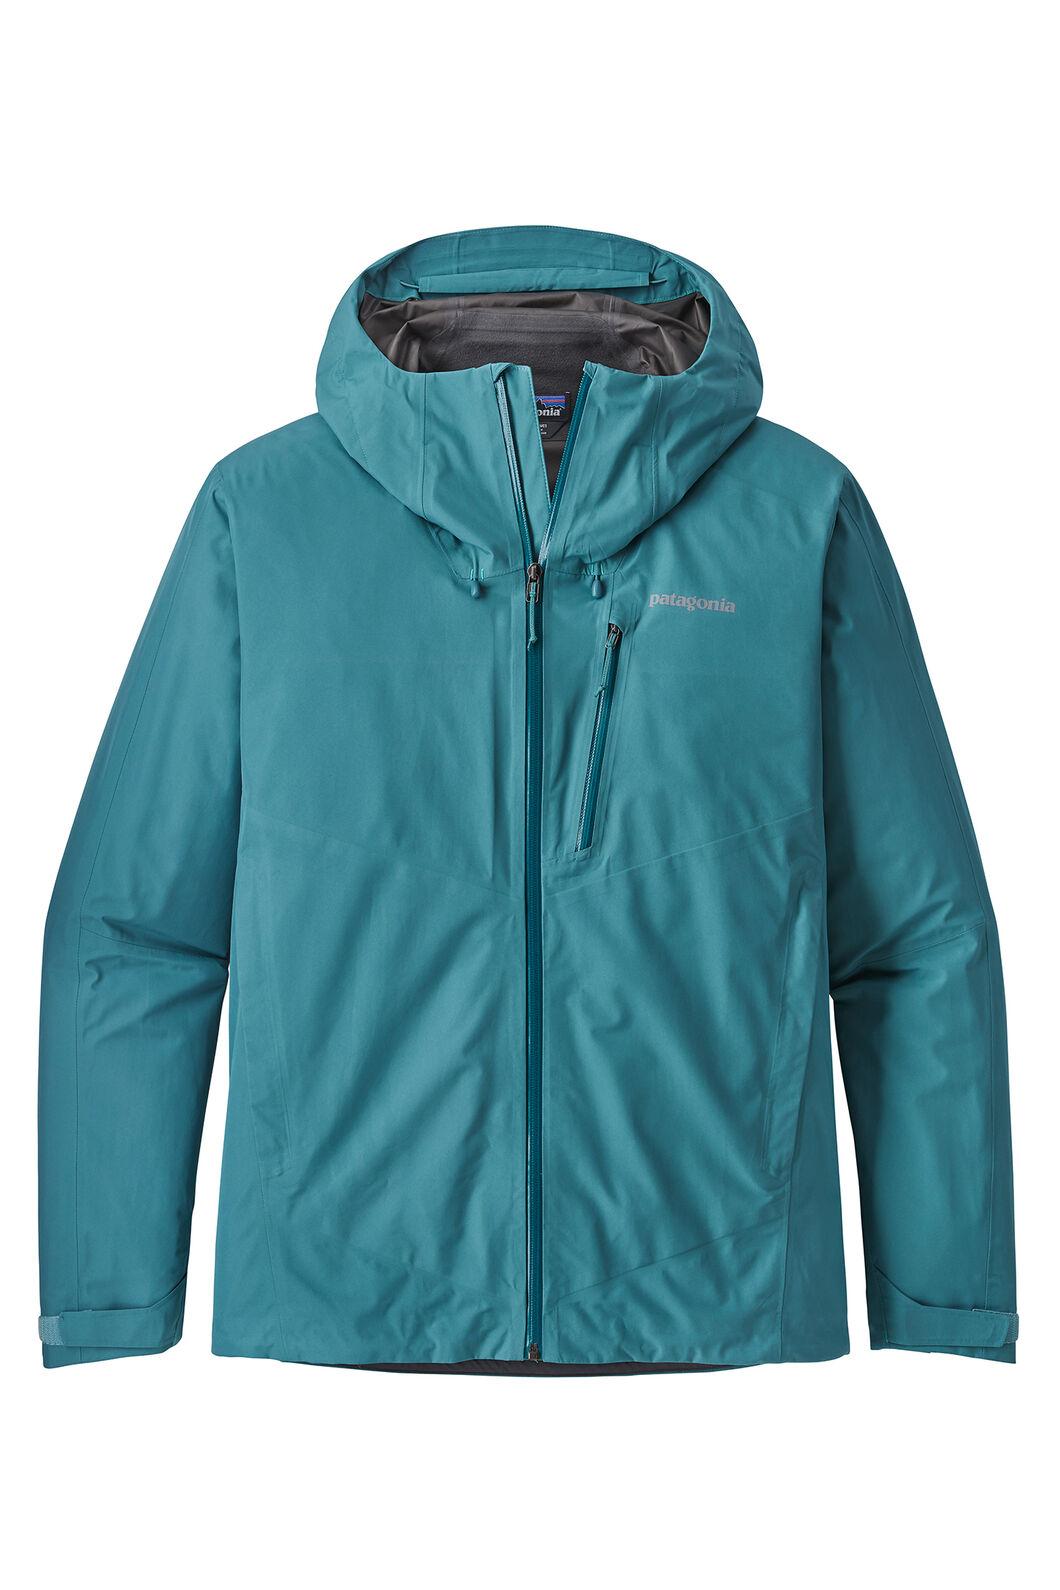 Patagonia Calcite Jacket — Men's, Tasmanian Teal, hi-res